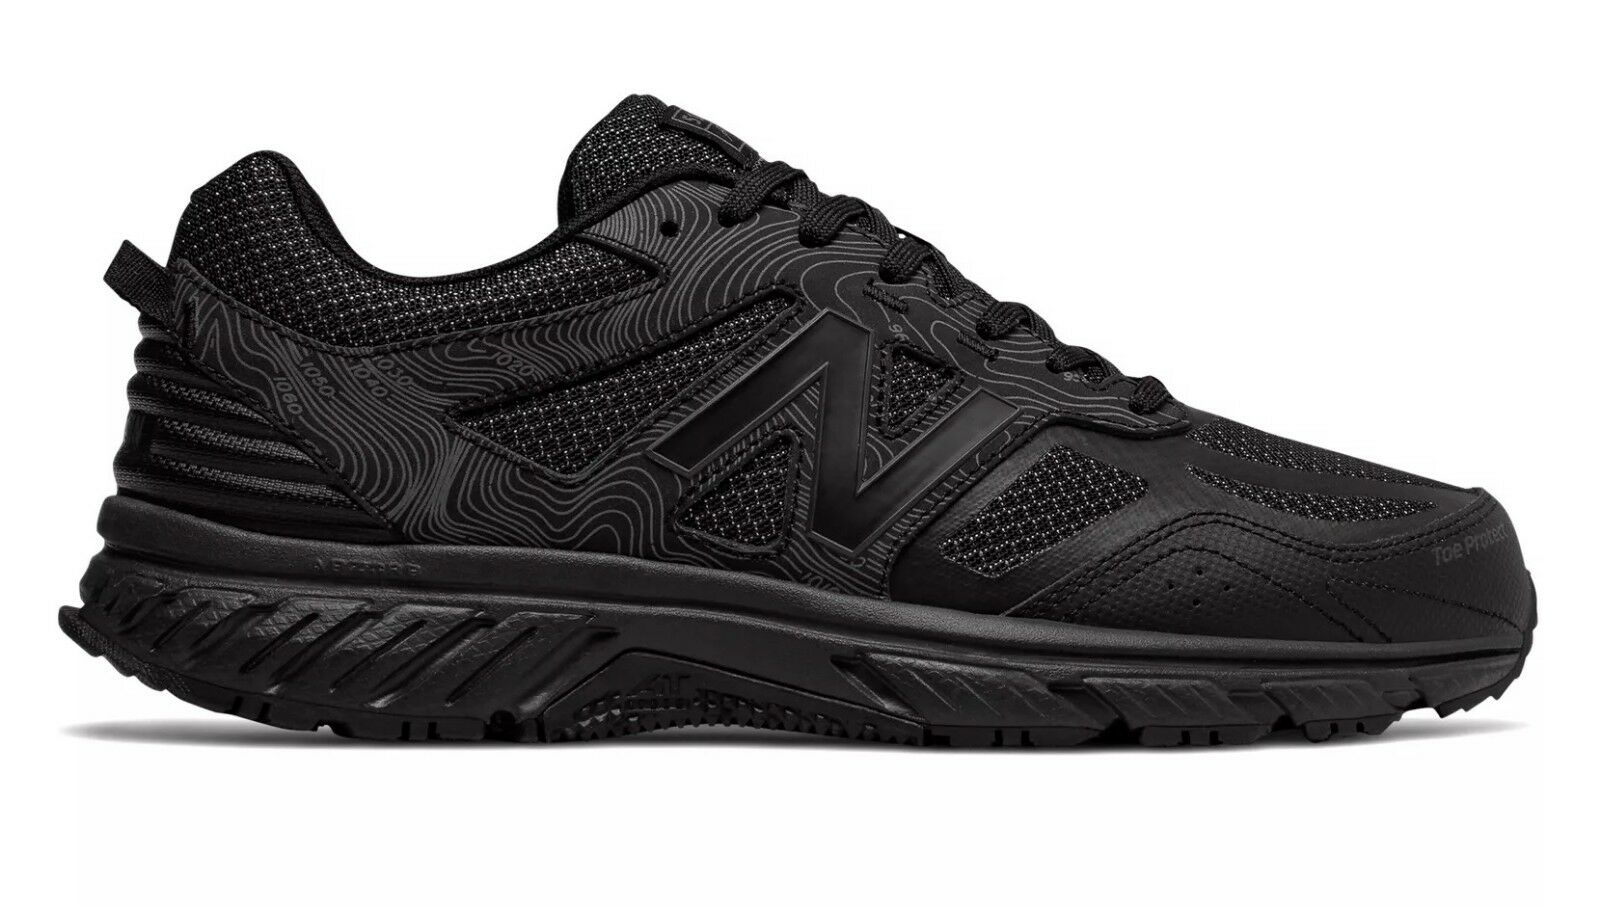 e665c941cc6 New Balance Men s 510 v4 MT510LB4 MT510LB4 MT510LB4 Black Trail Running  shoes SIZES NIB WIDE 4E